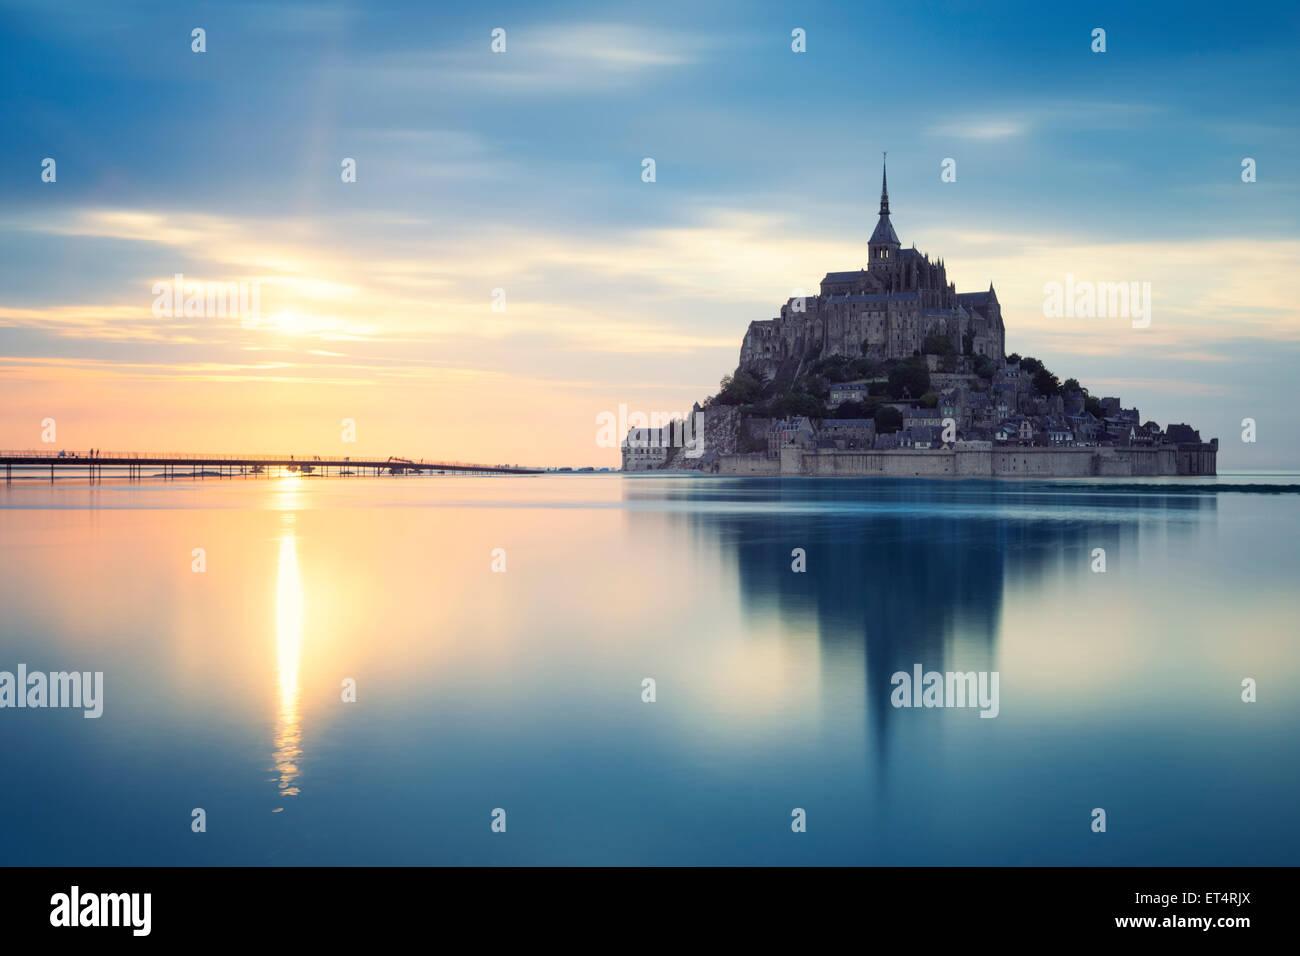 Mont-Saint-Michel al atardecer, Francia, Europa. Imagen De Stock